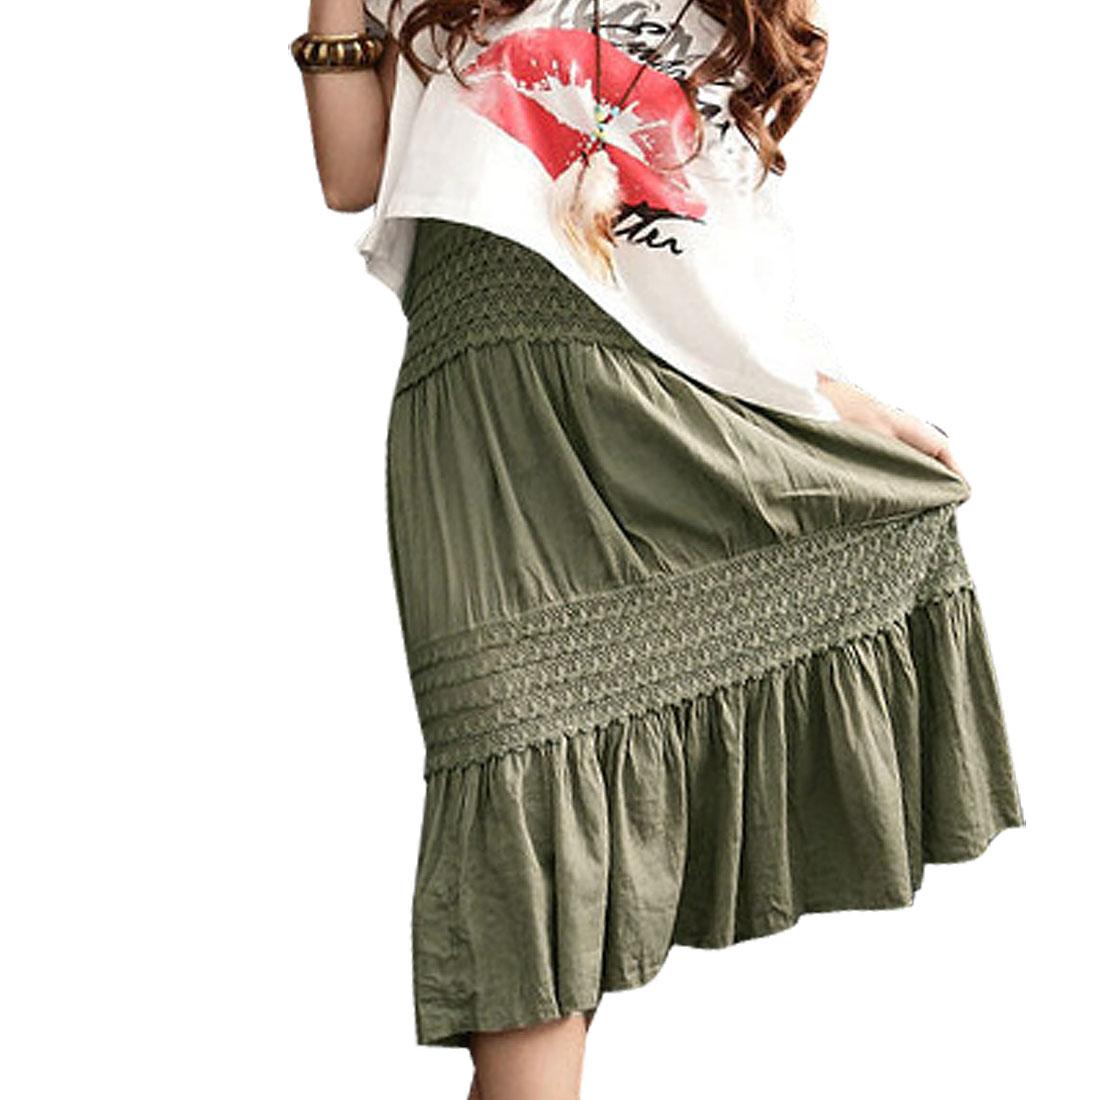 Ladies Olive Green Lining Mid Calf Elastic Waist Skirt XS